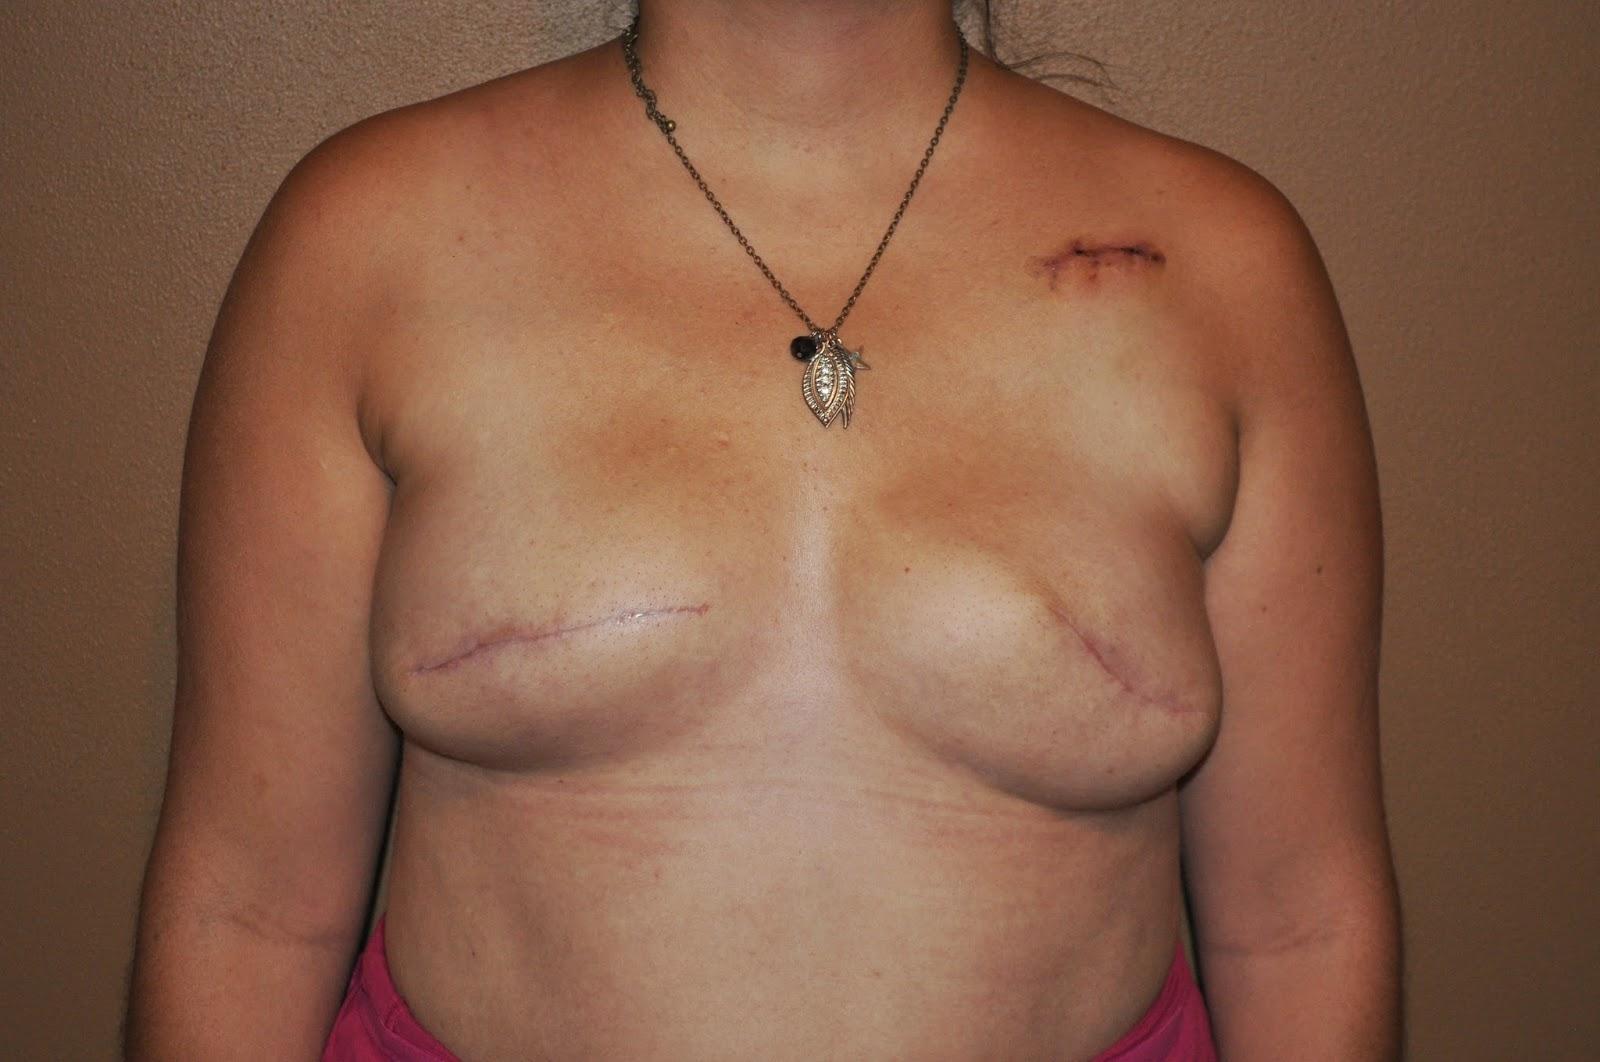 tissue expansion, breast cancer, breast cancer survivor, survivor, reconstruction, plastic surgery, scars